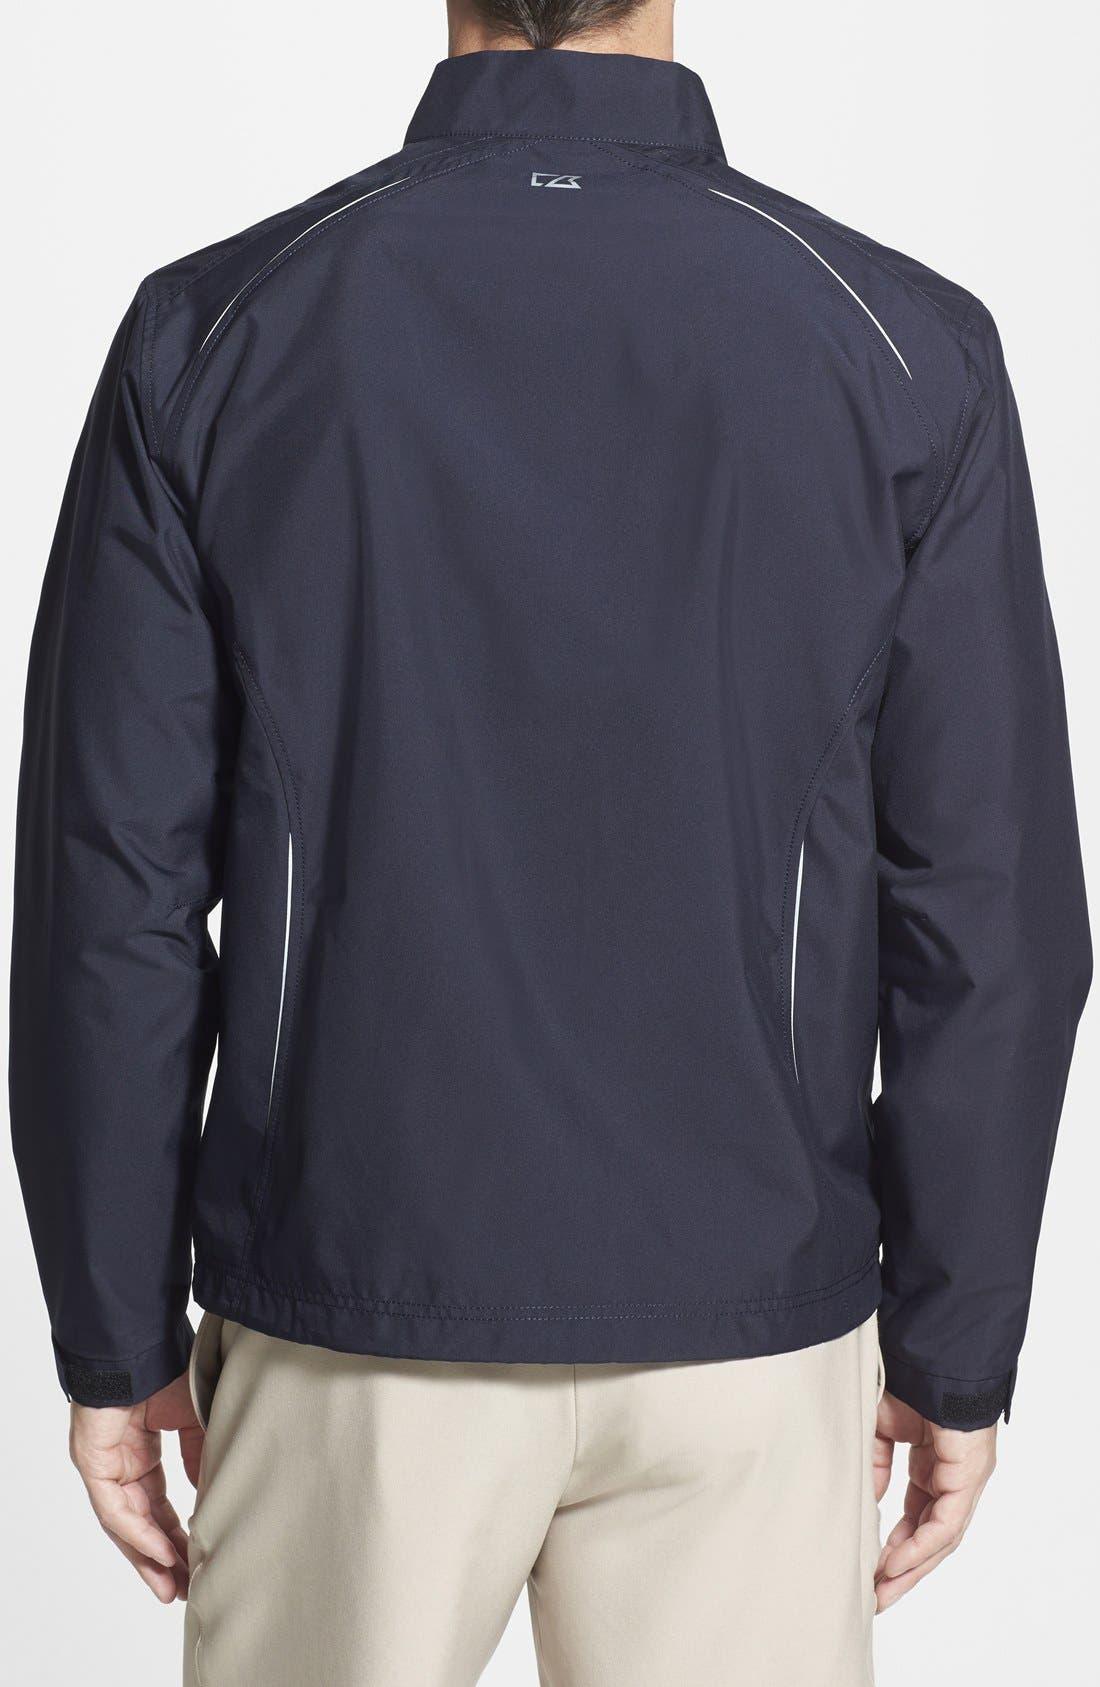 'Chicago Bears - Beacon' WeatherTec Wind & Water Resistant Jacket,                             Alternate thumbnail 2, color,                             410